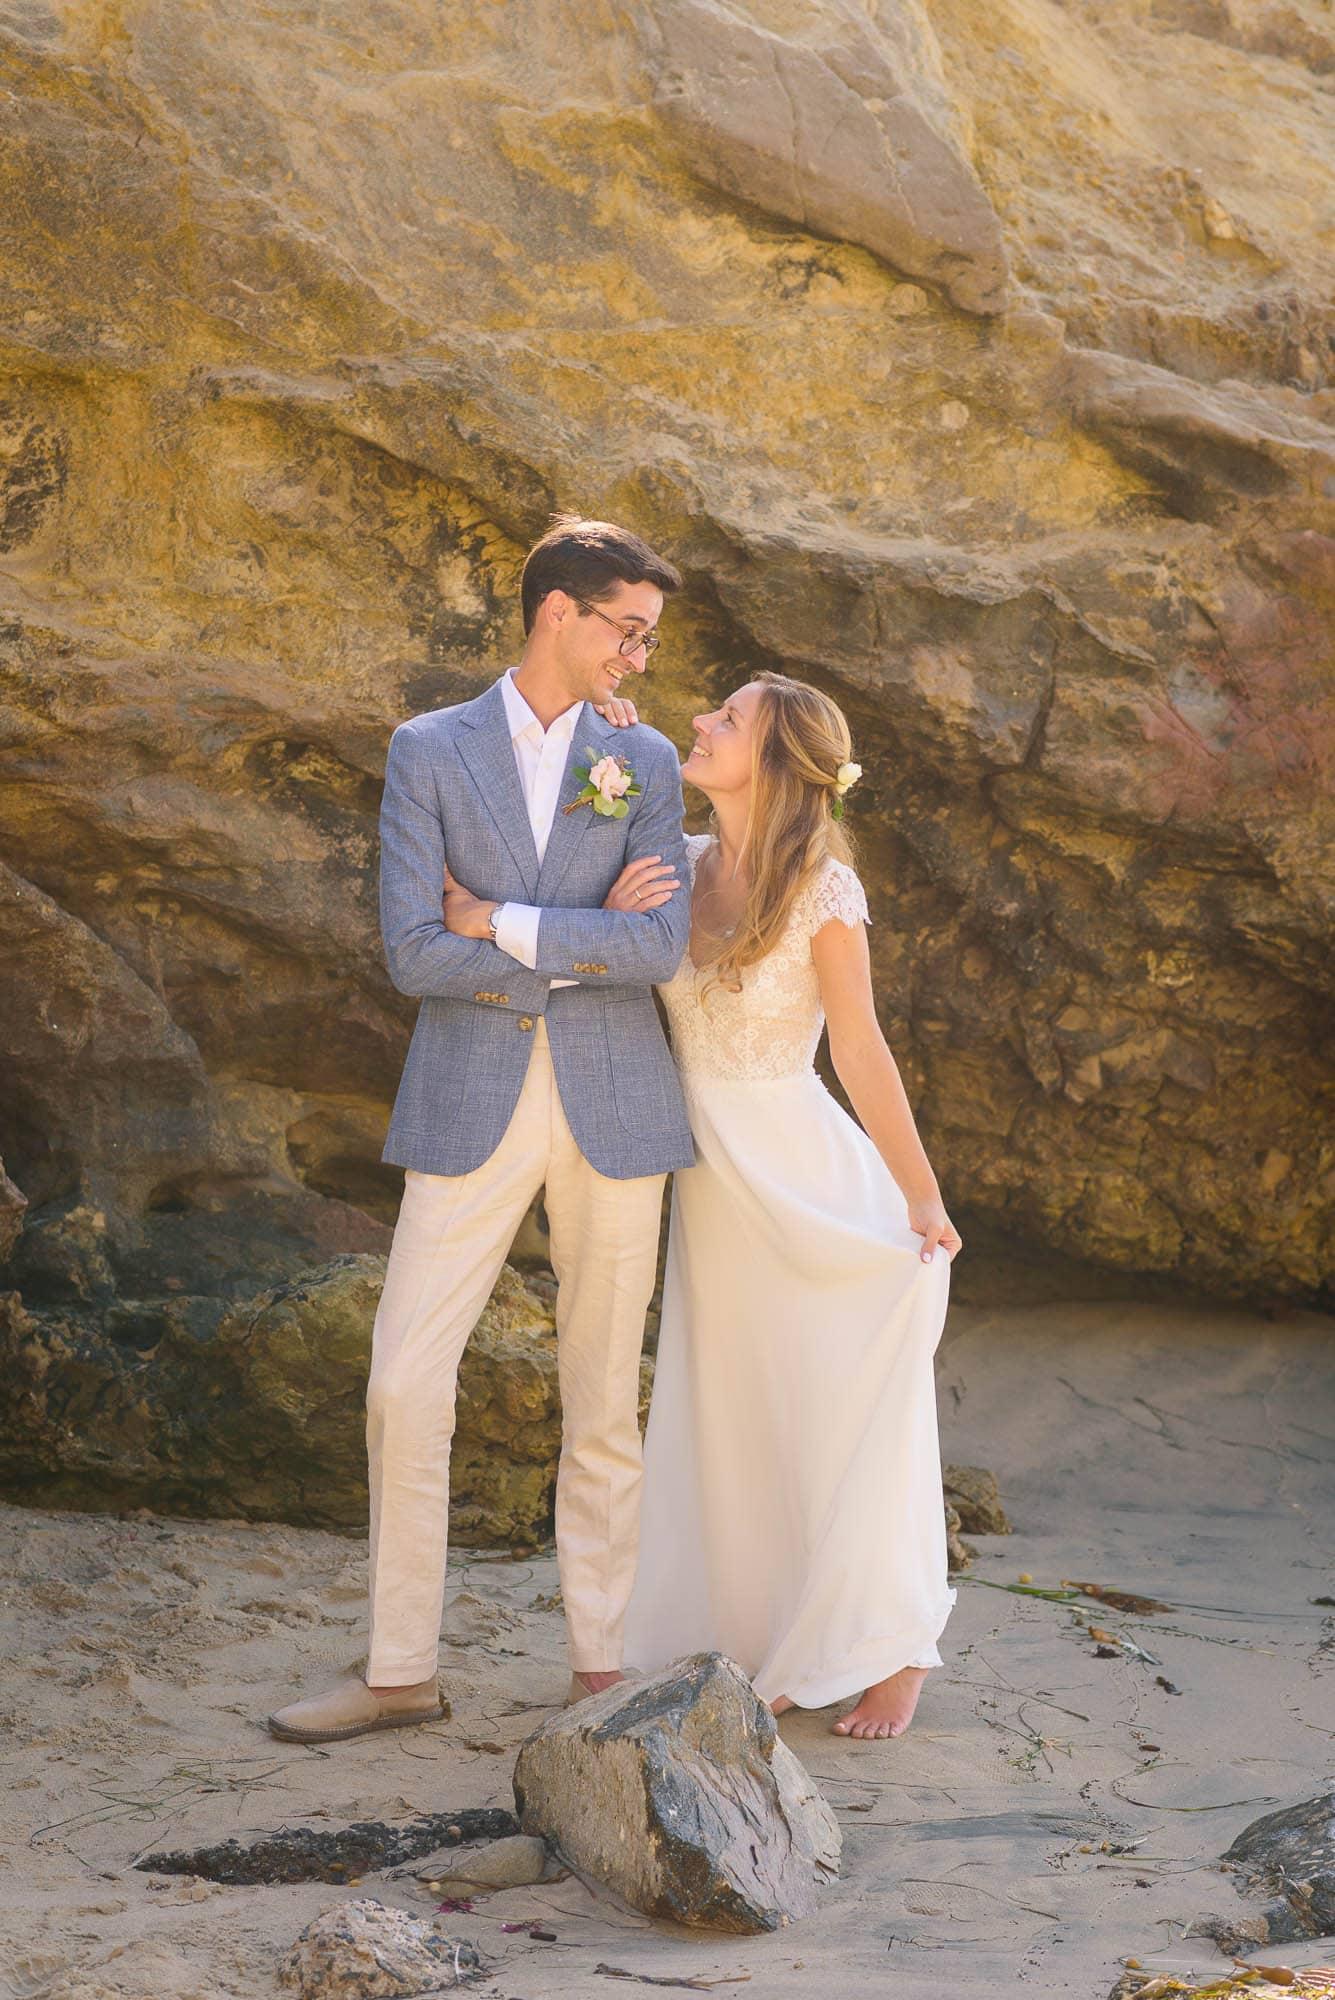 046_Alan_and_Heidi_Wedding_Verena_Andreas